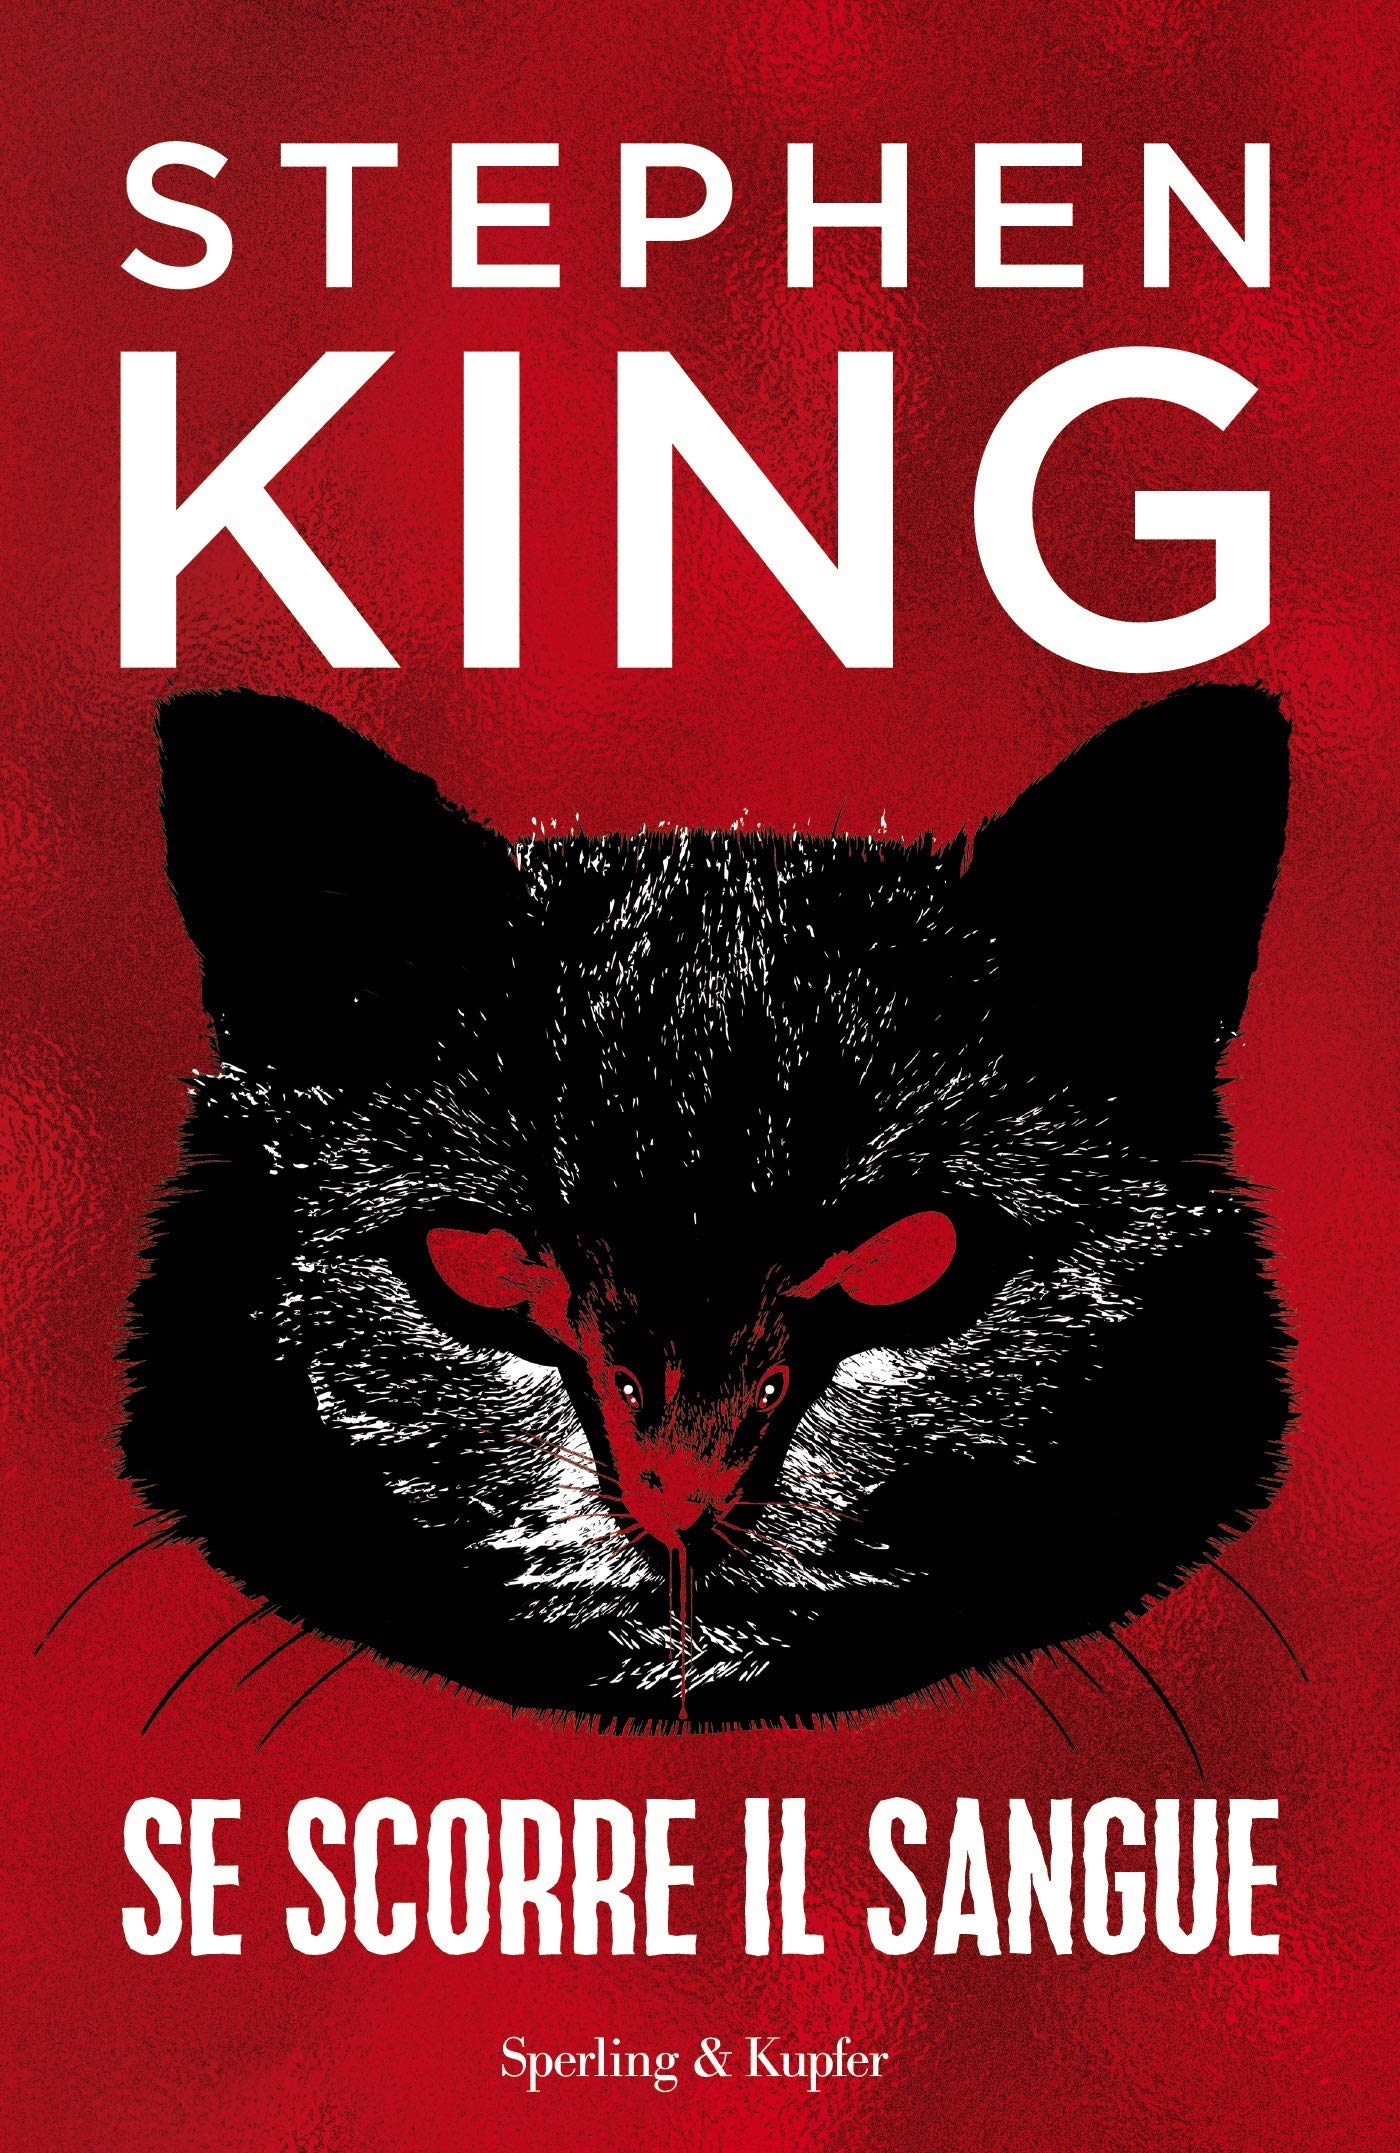 Stephen King – Se Scorre il Sangue